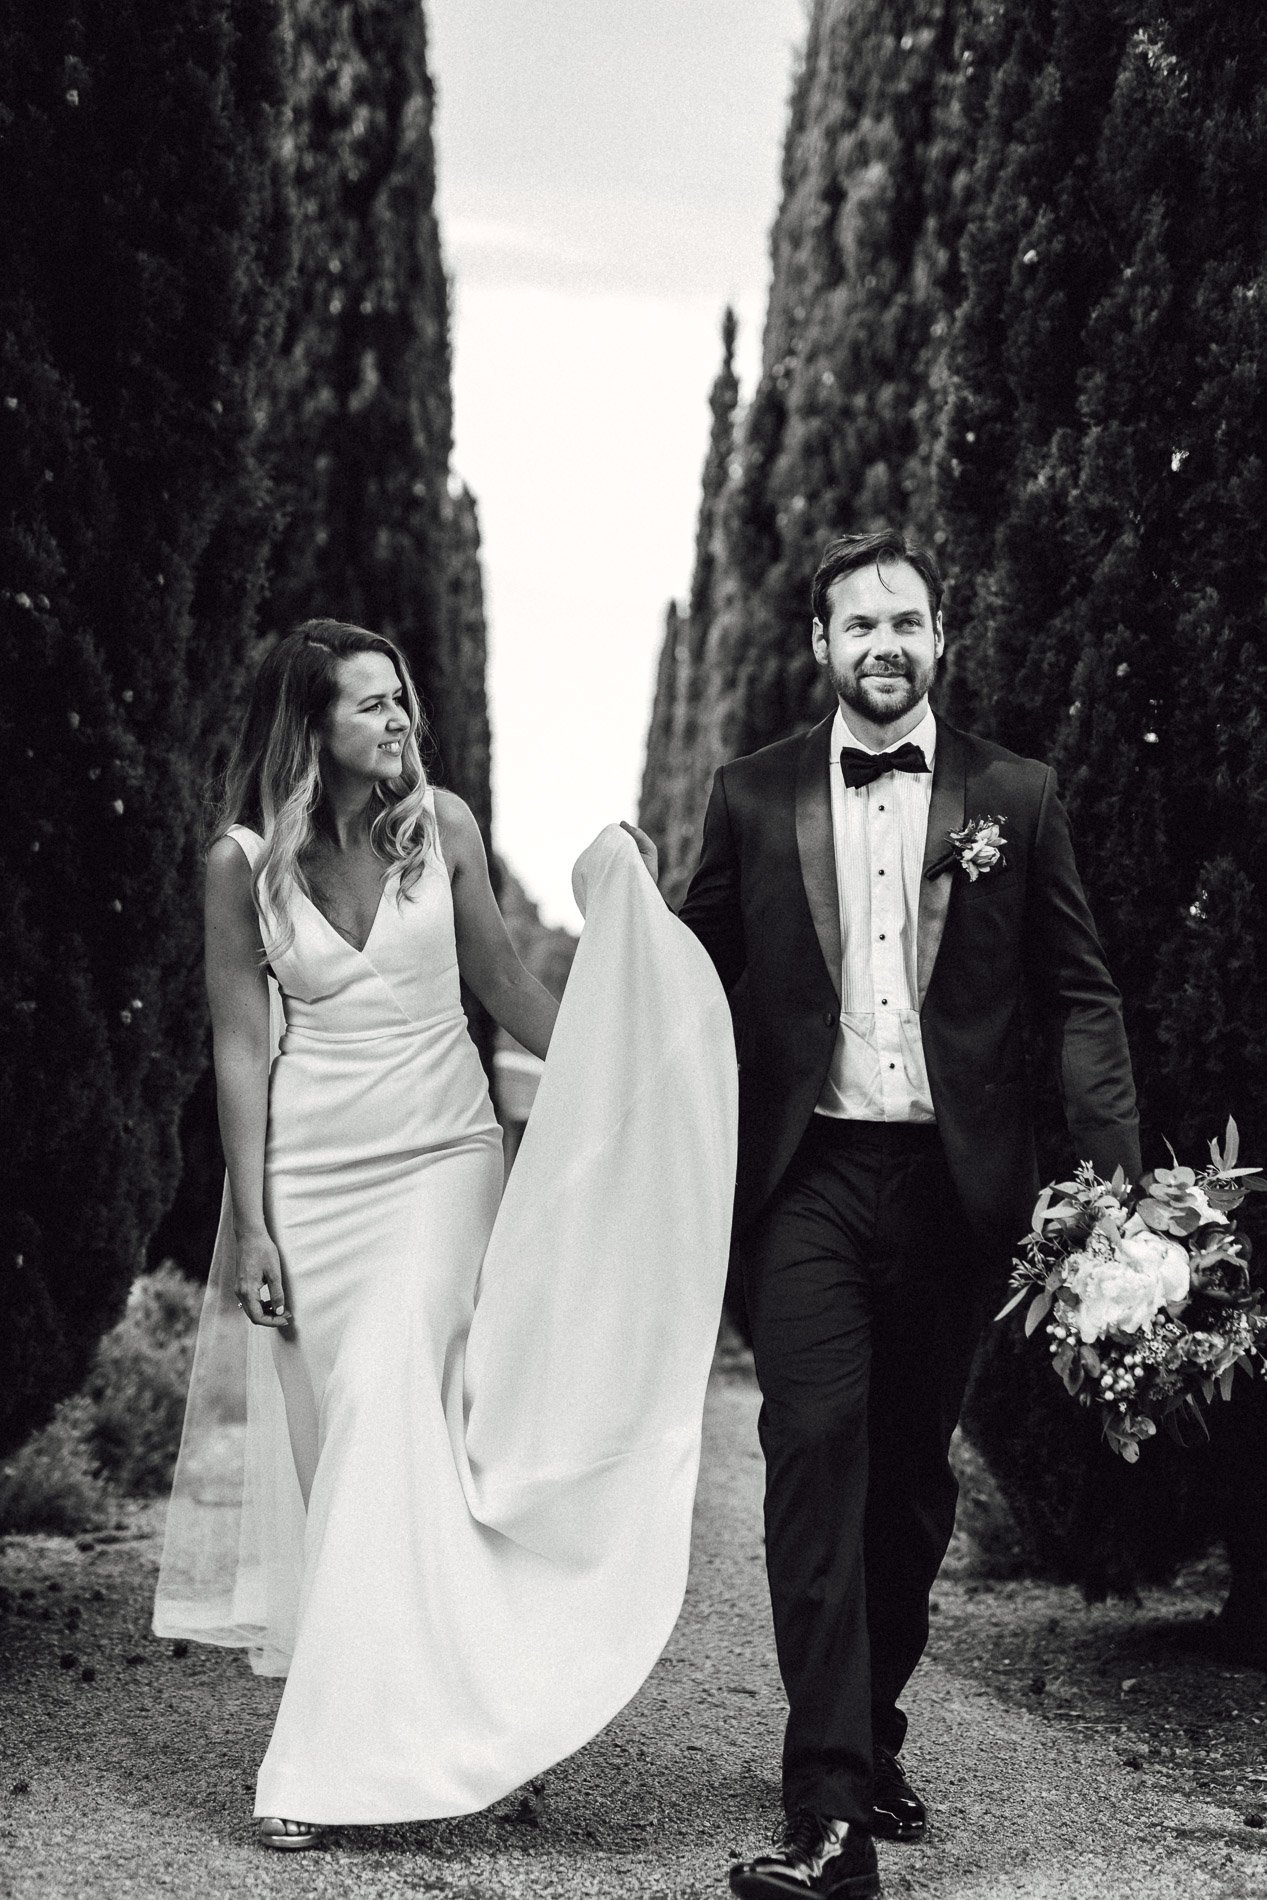 Panton Vineyard wedding fern and sone photography red hill wedding bride and groom